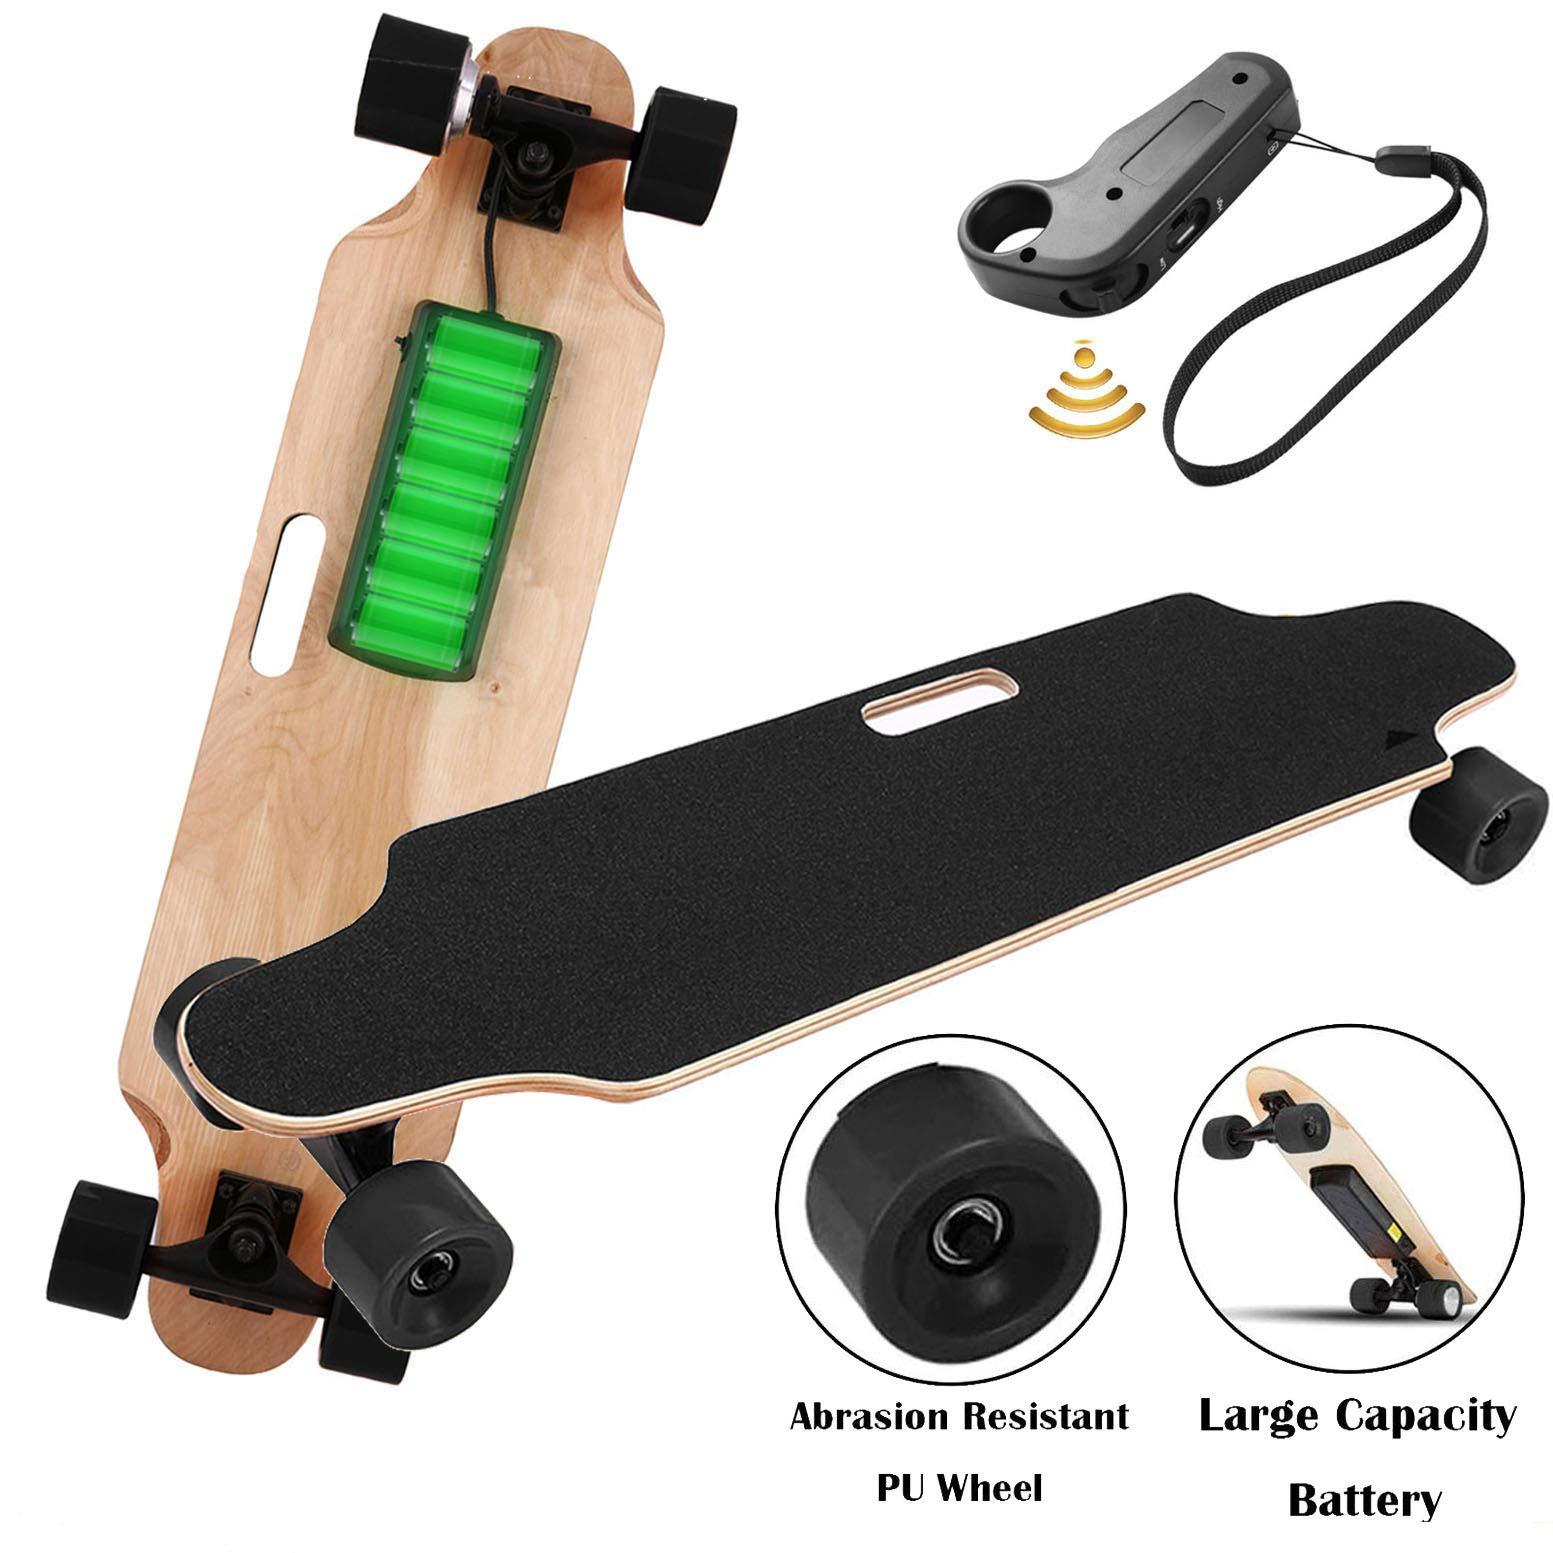 Aceshin Skateboard Motorized Longboard Christmas